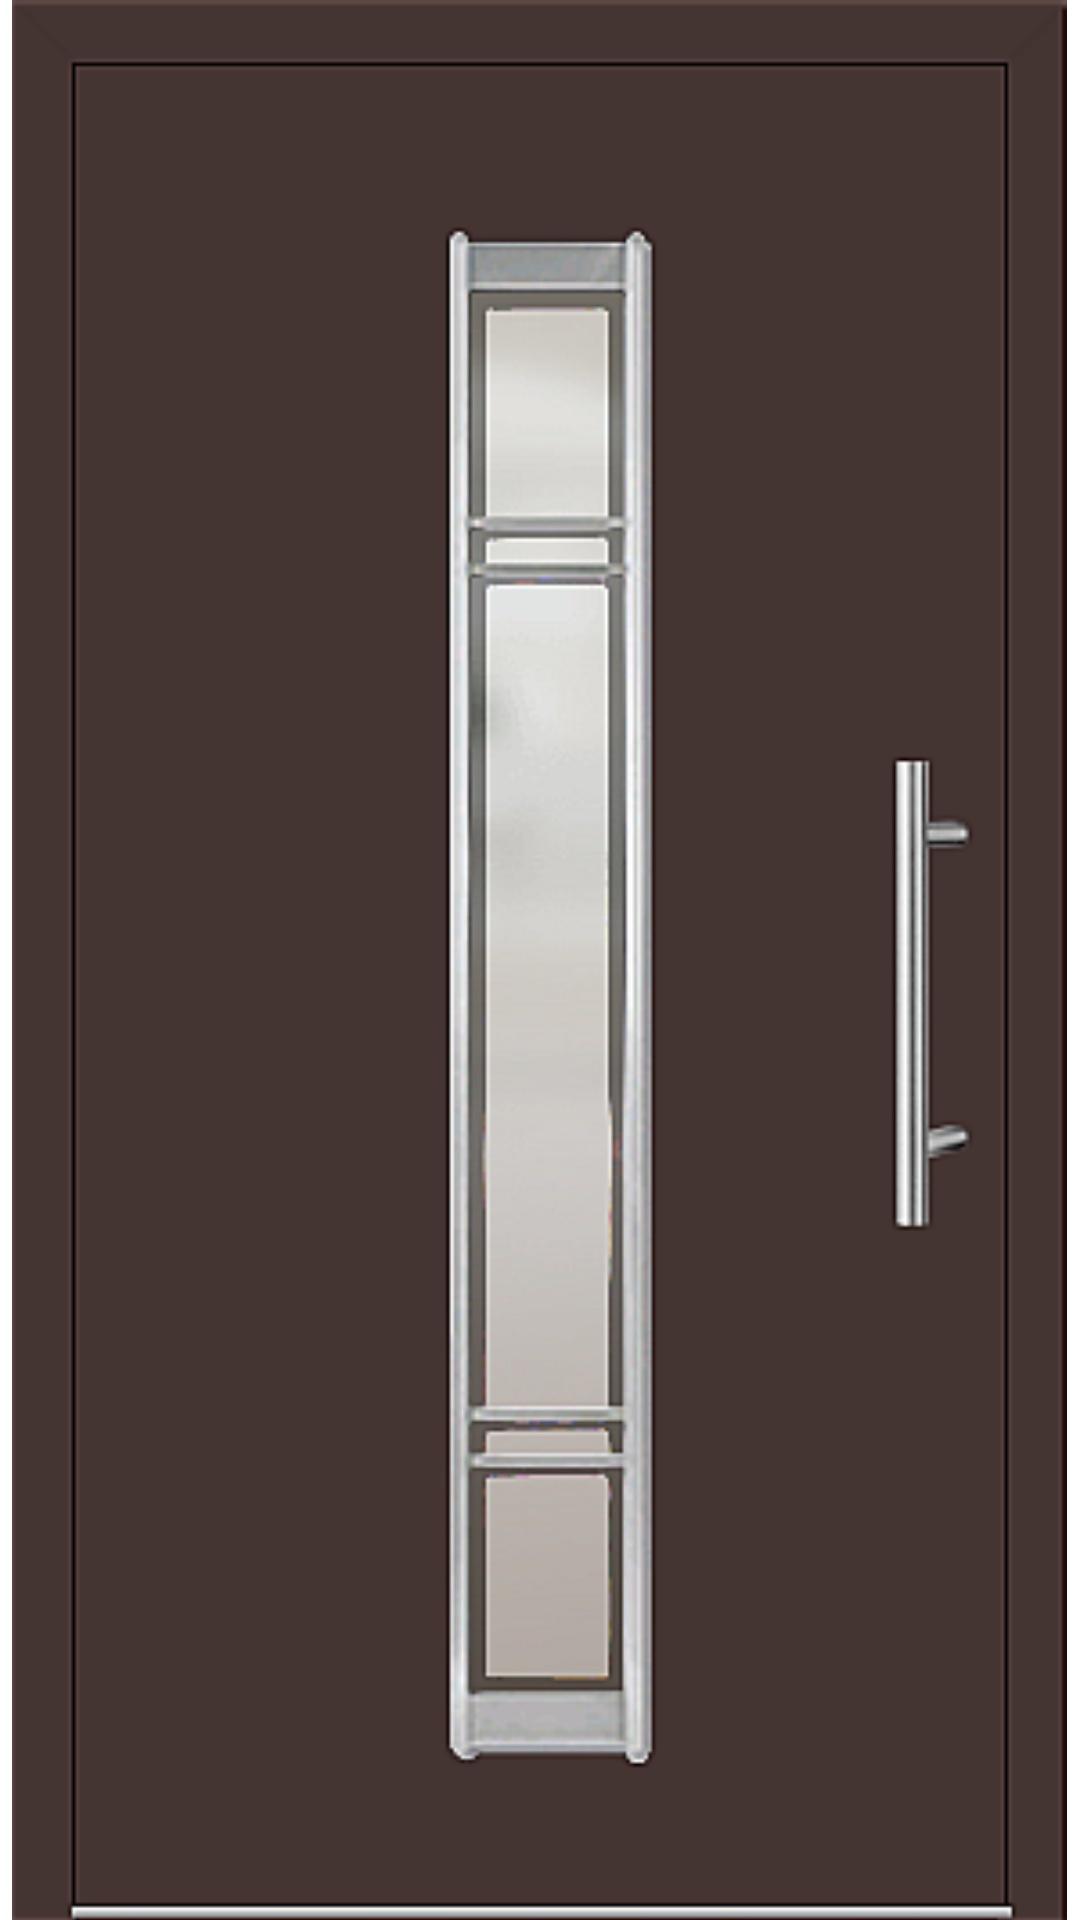 Aluminium Haustür Modell 6977-79 mahagonibraun